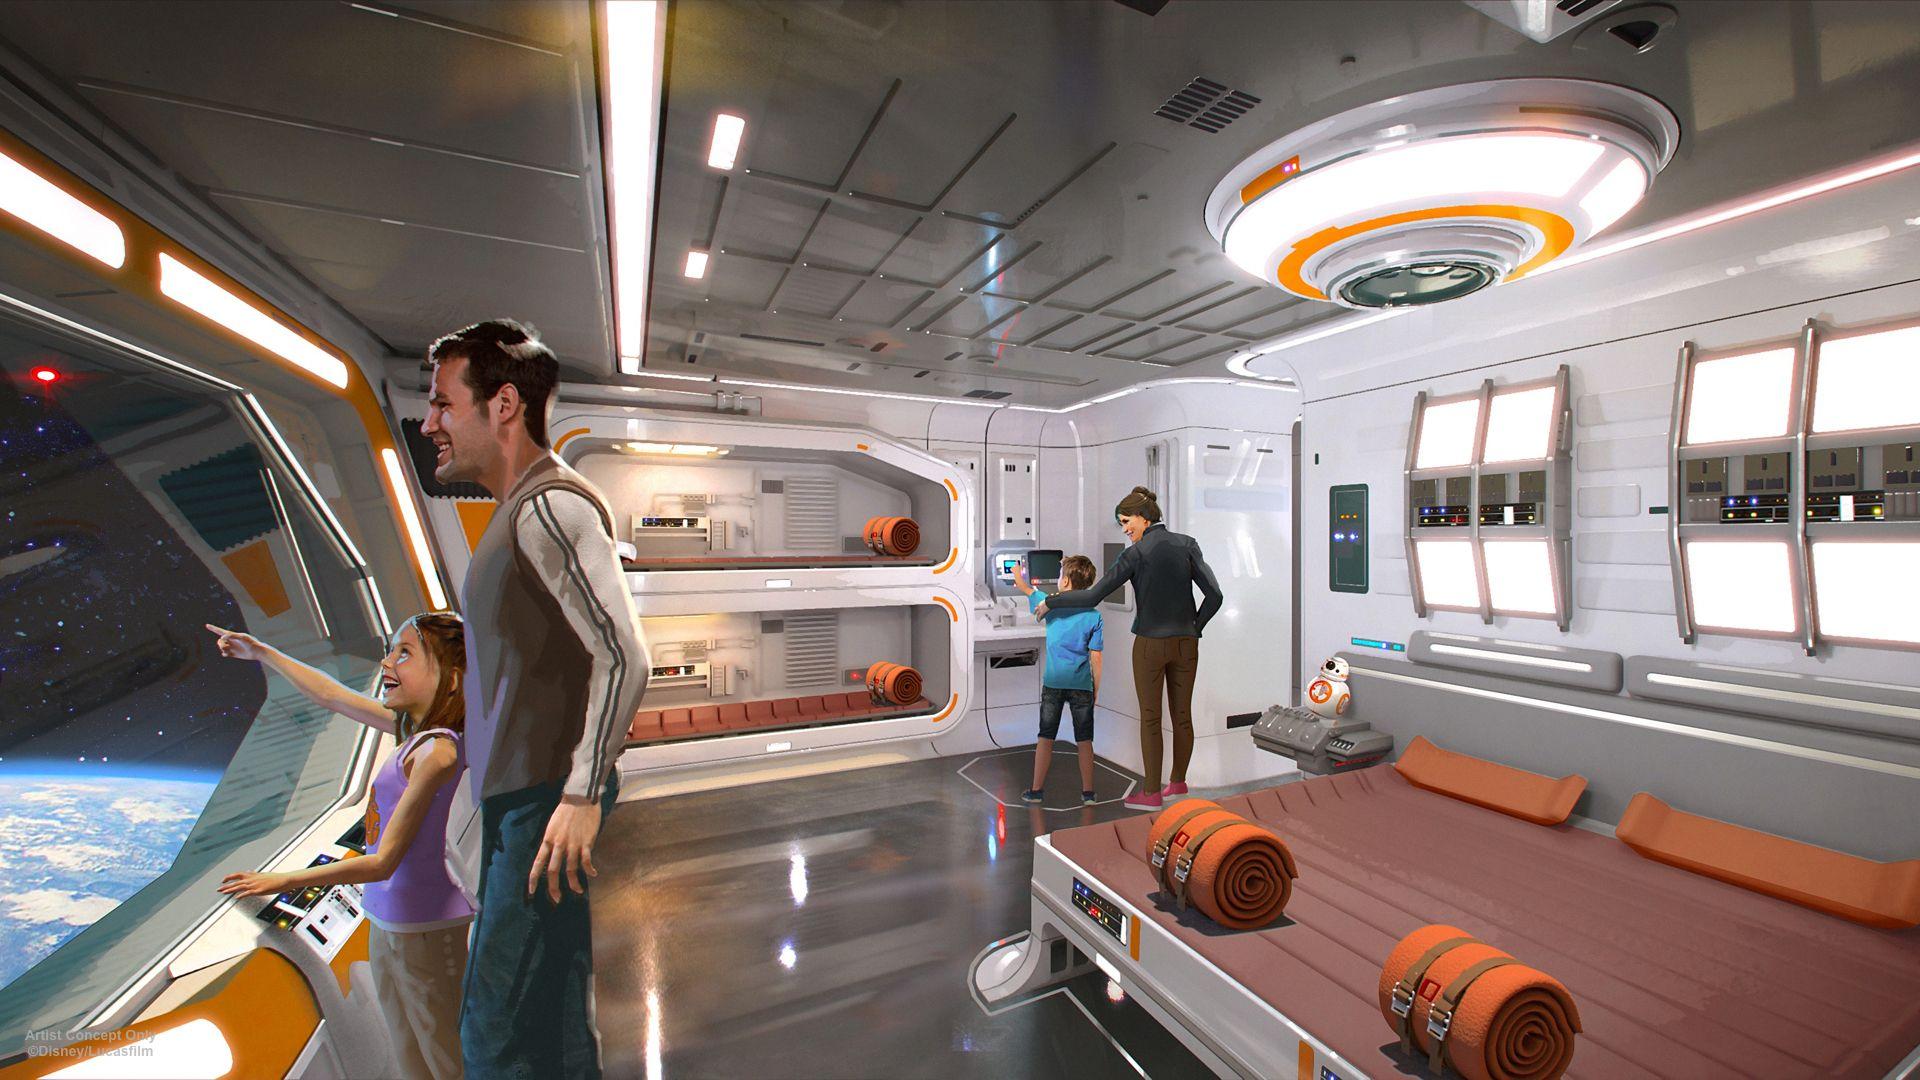 star wars hotel walt disney world 2 - More Details Arise for That 'Star Wars'- Themed Hotel at Walt Disney World